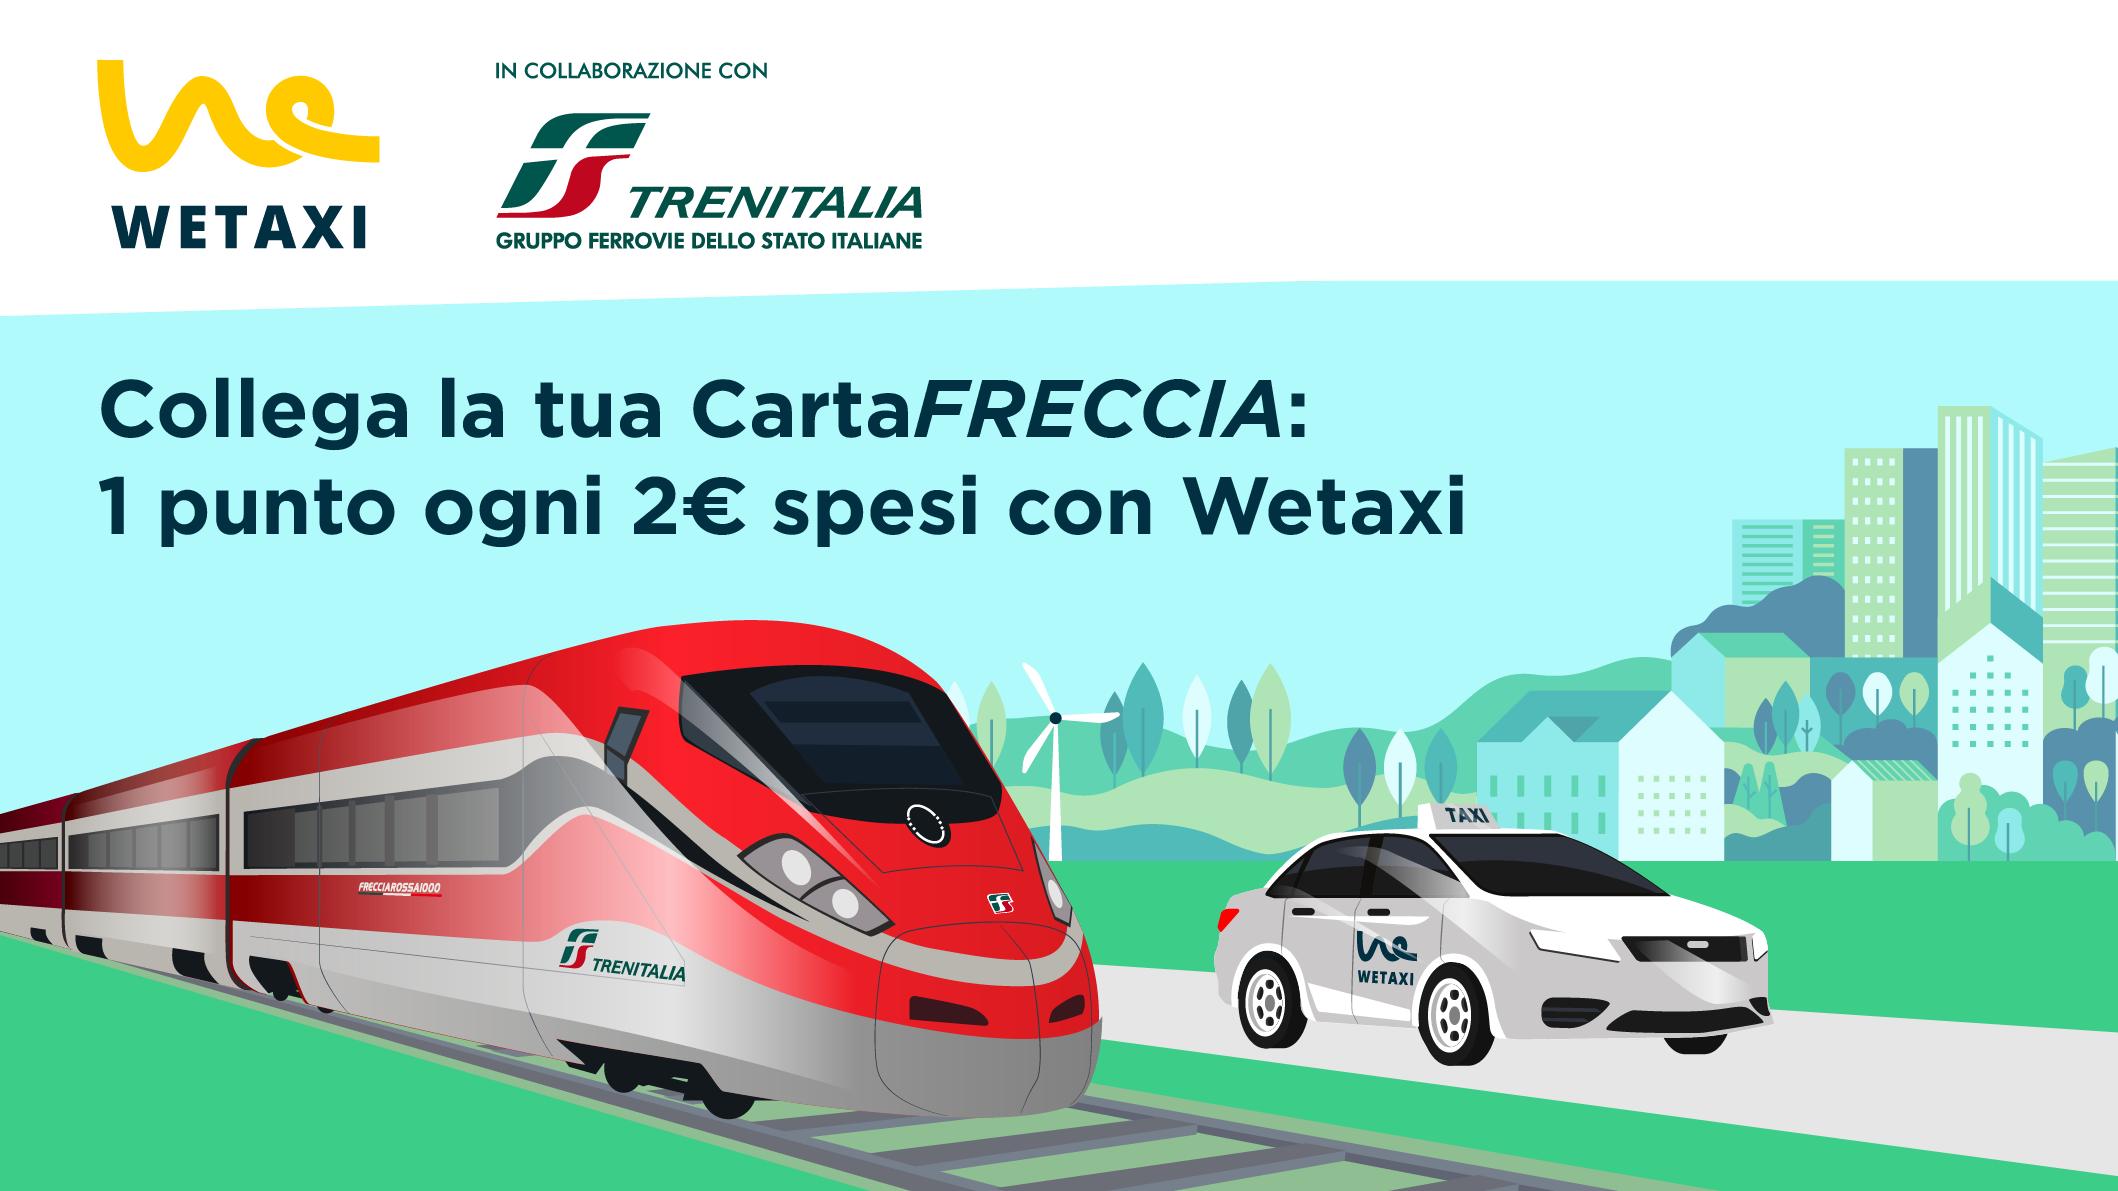 Wetaxi e Trenitalia